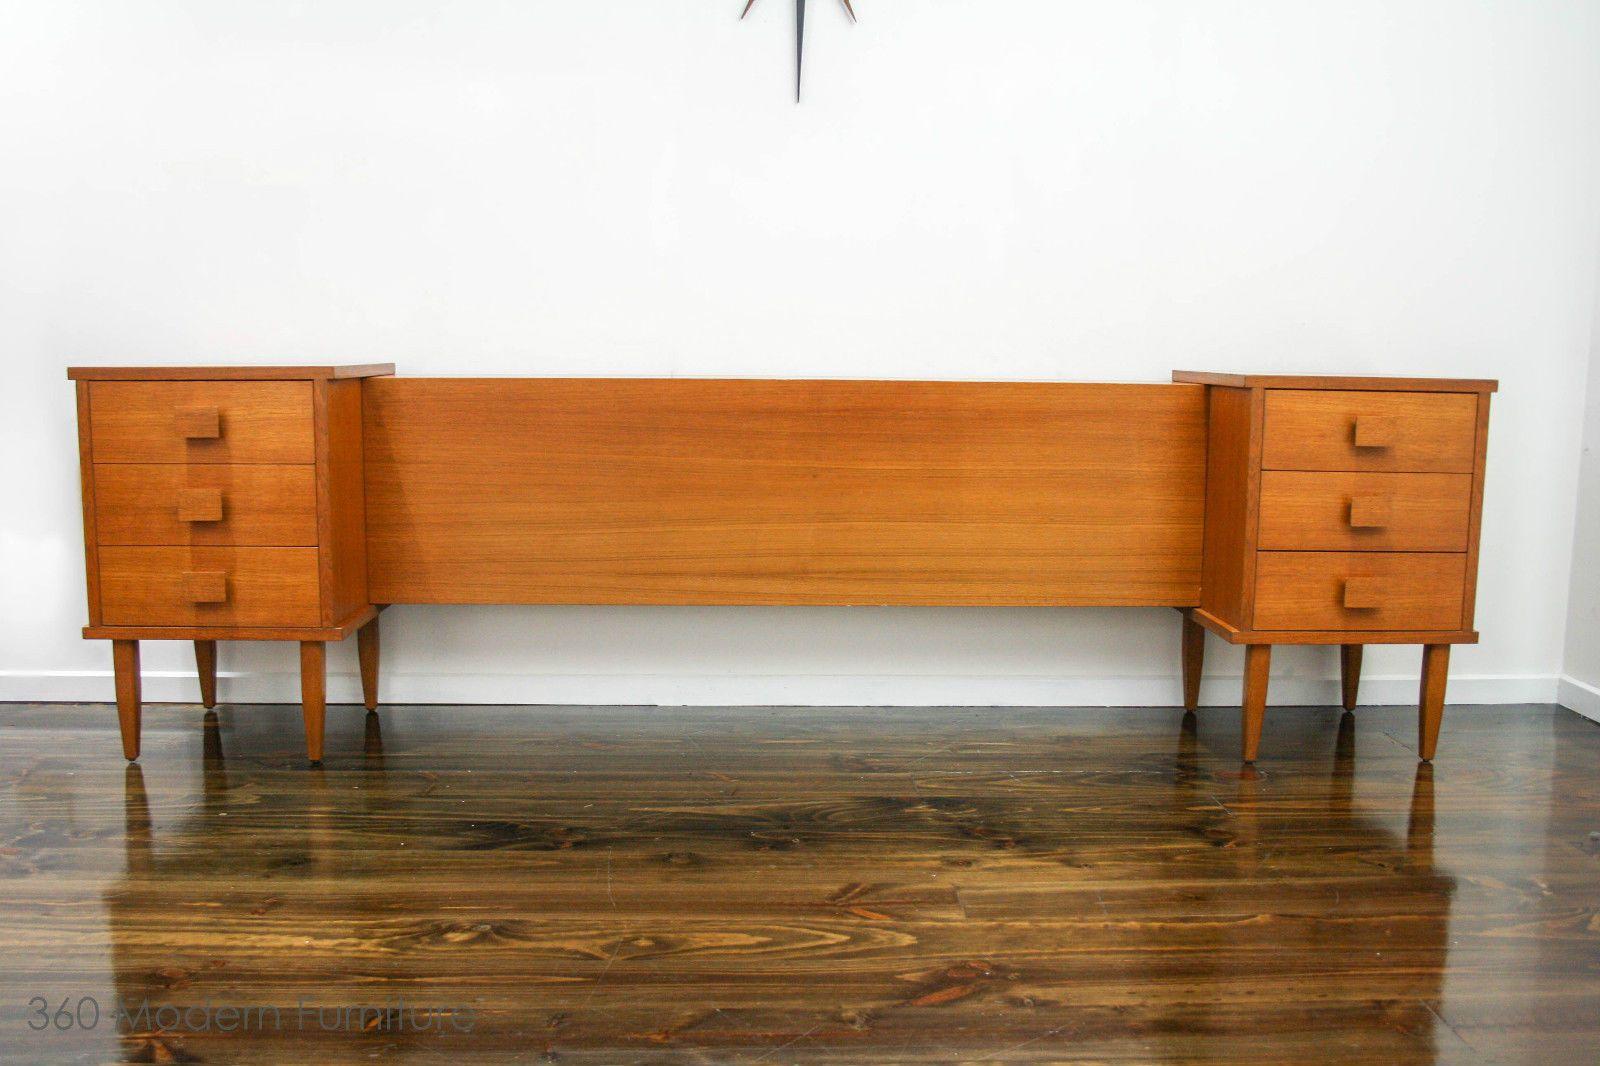 Mid century qs bedside tables drawers bedhead retro vintage danish parker eames in narre warren vic ebay 360 modern furniture burgess